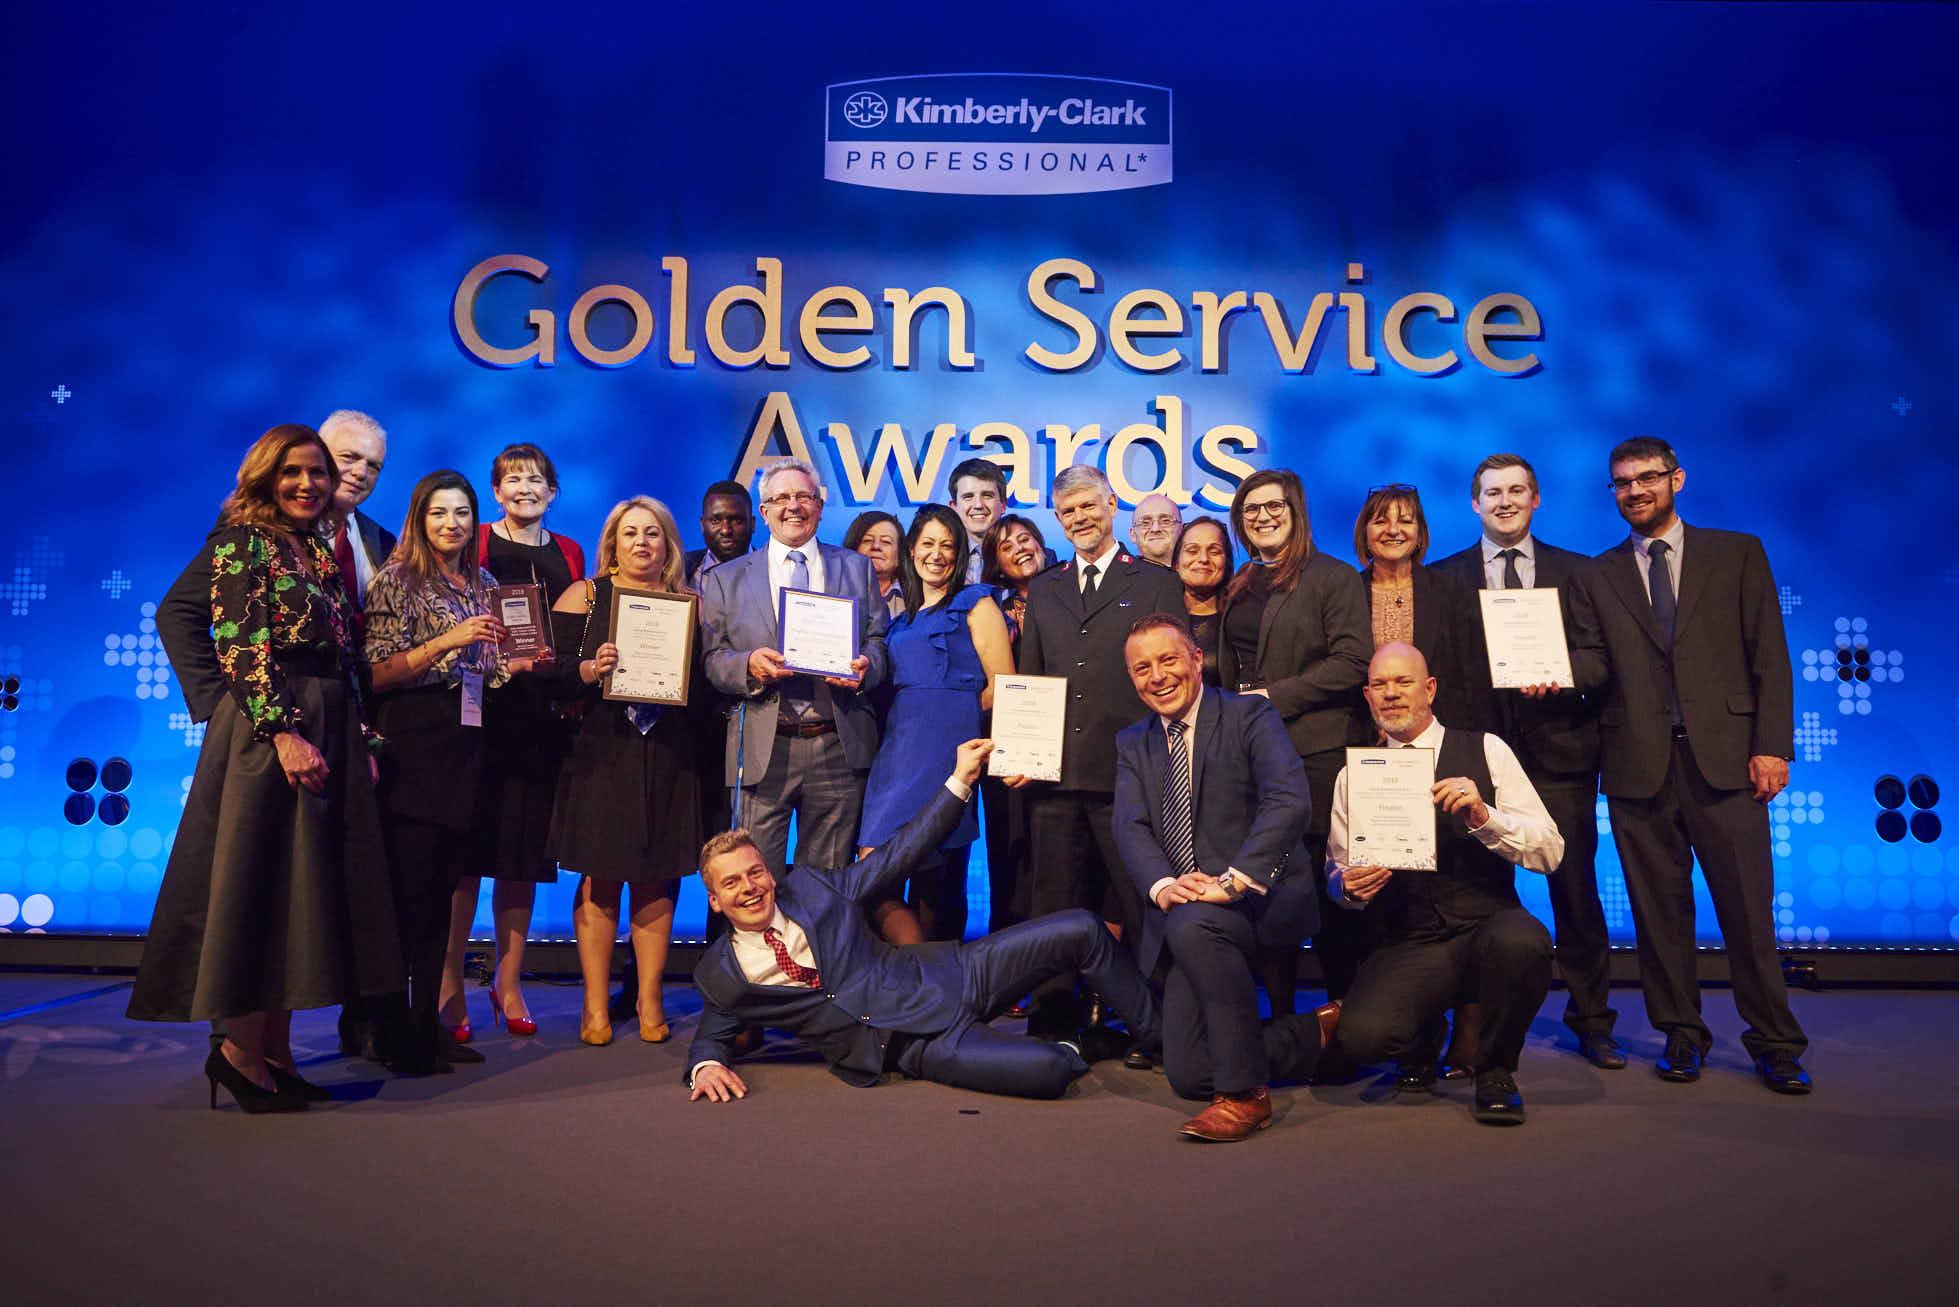 The Kimberly-Clark Professional Golden Service Awards 2018